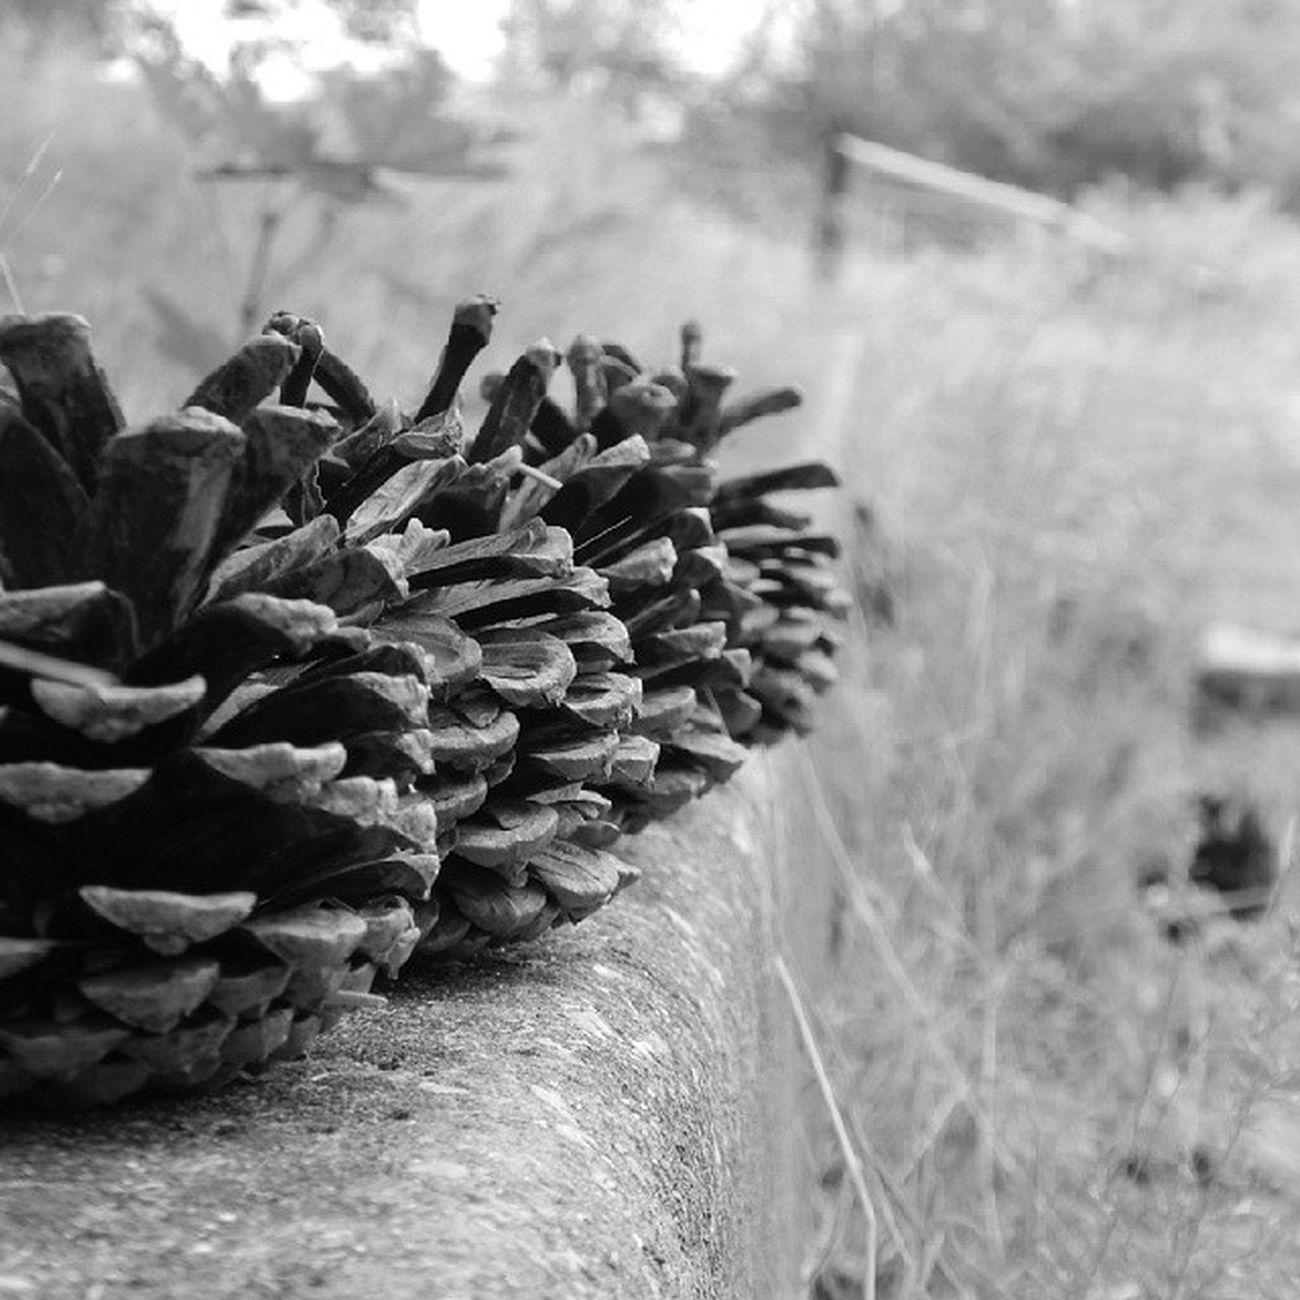 Целый урожай шишек))) Лес Природа урожай ШИШКИ Николаев Nikolaevgram Nikolaev девочкитакиедевочки